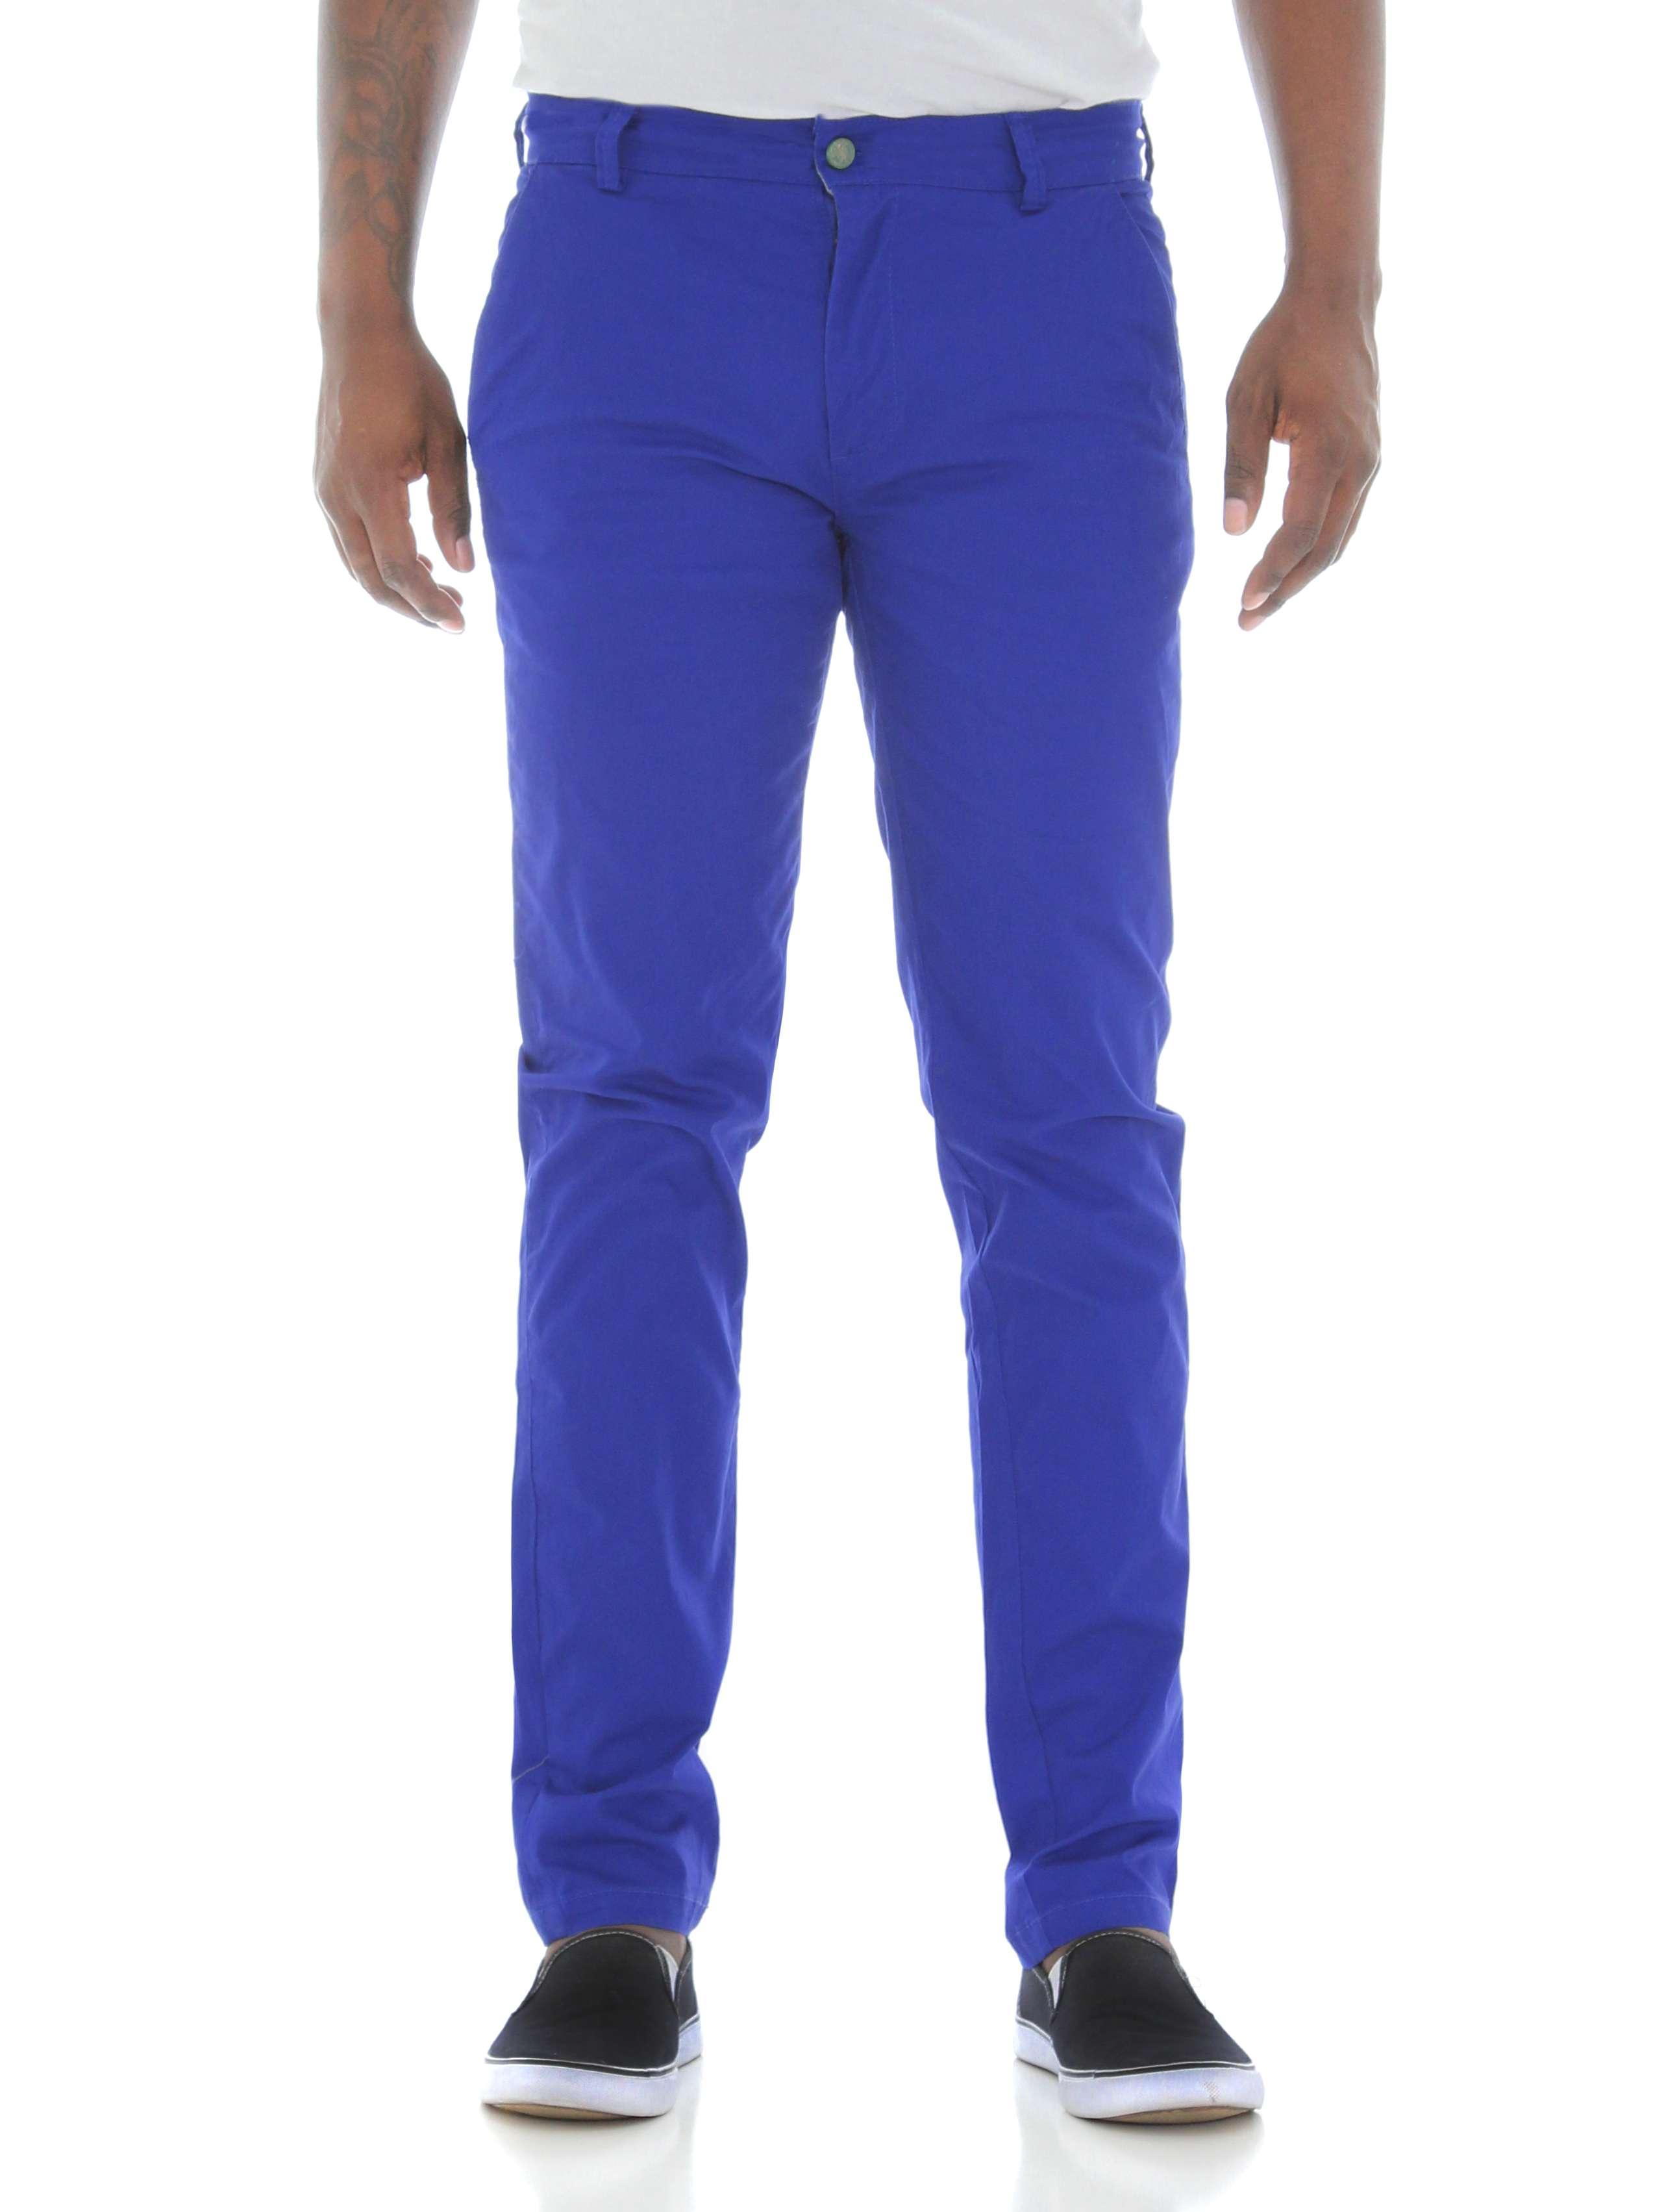 d2ecadcab51f8 Royal Blue Men s Skinny Fit Stretch Twill Chino Pants